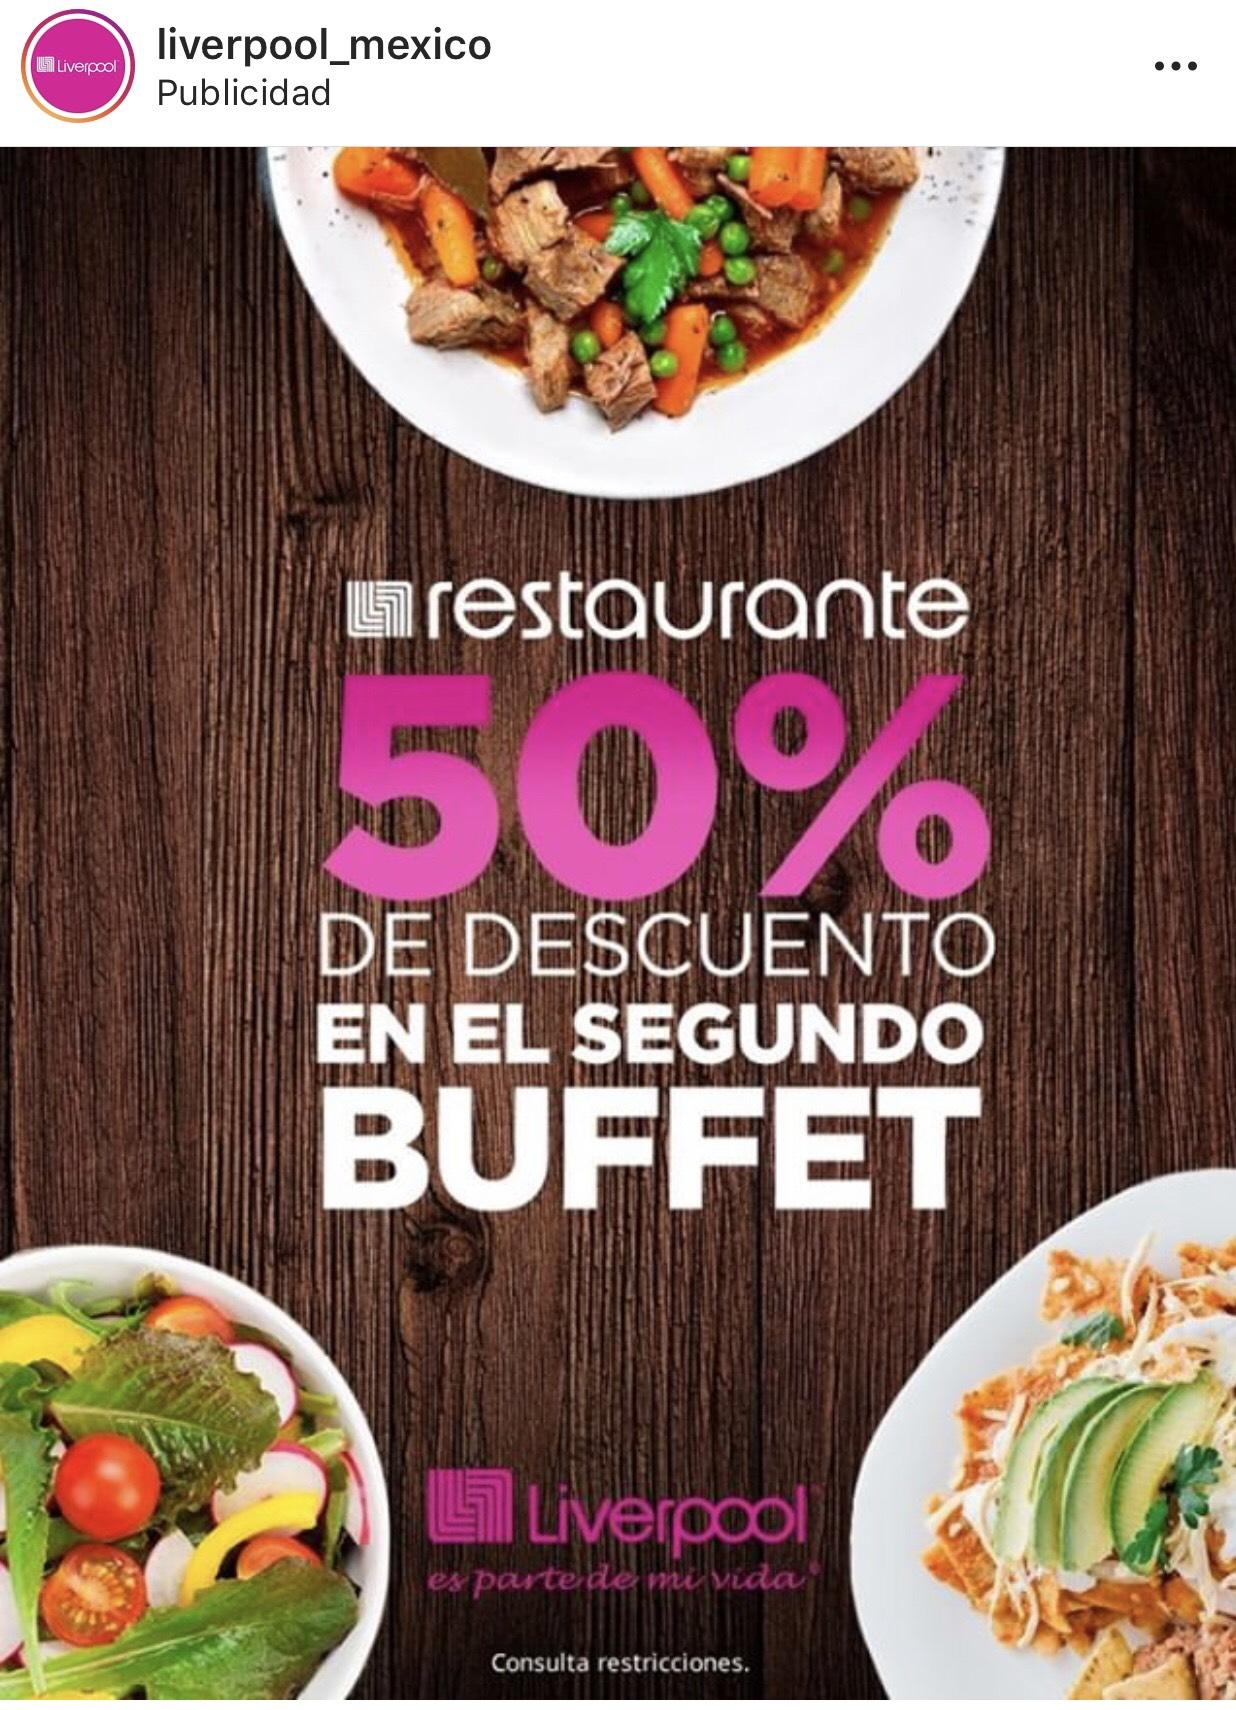 Liverpool Restaurante : buffet 2 x 1 1/2 (sucursales seleccionadas)